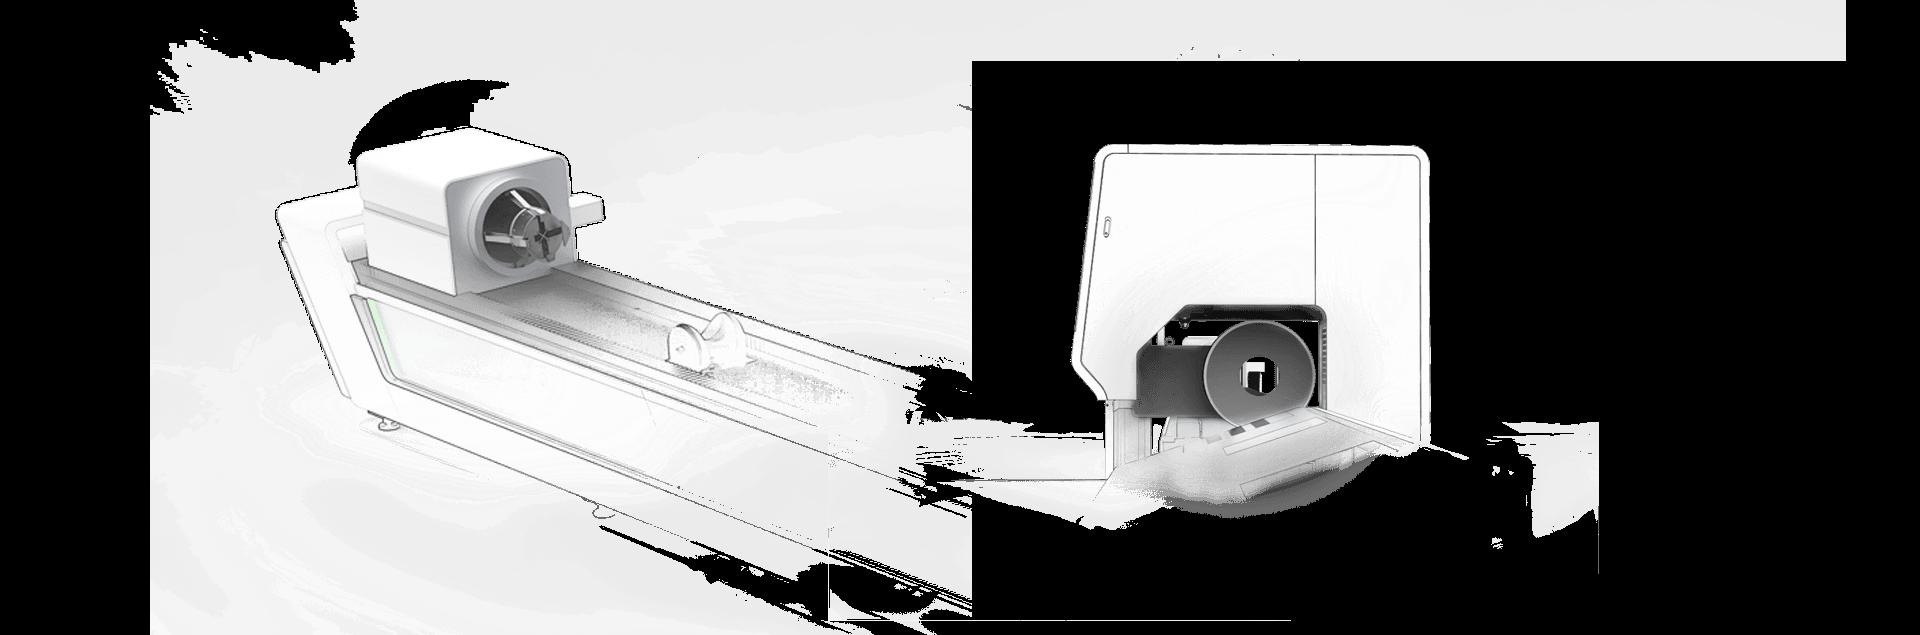 kapan - Станок для лазерной резки резки труб Bodor T-A